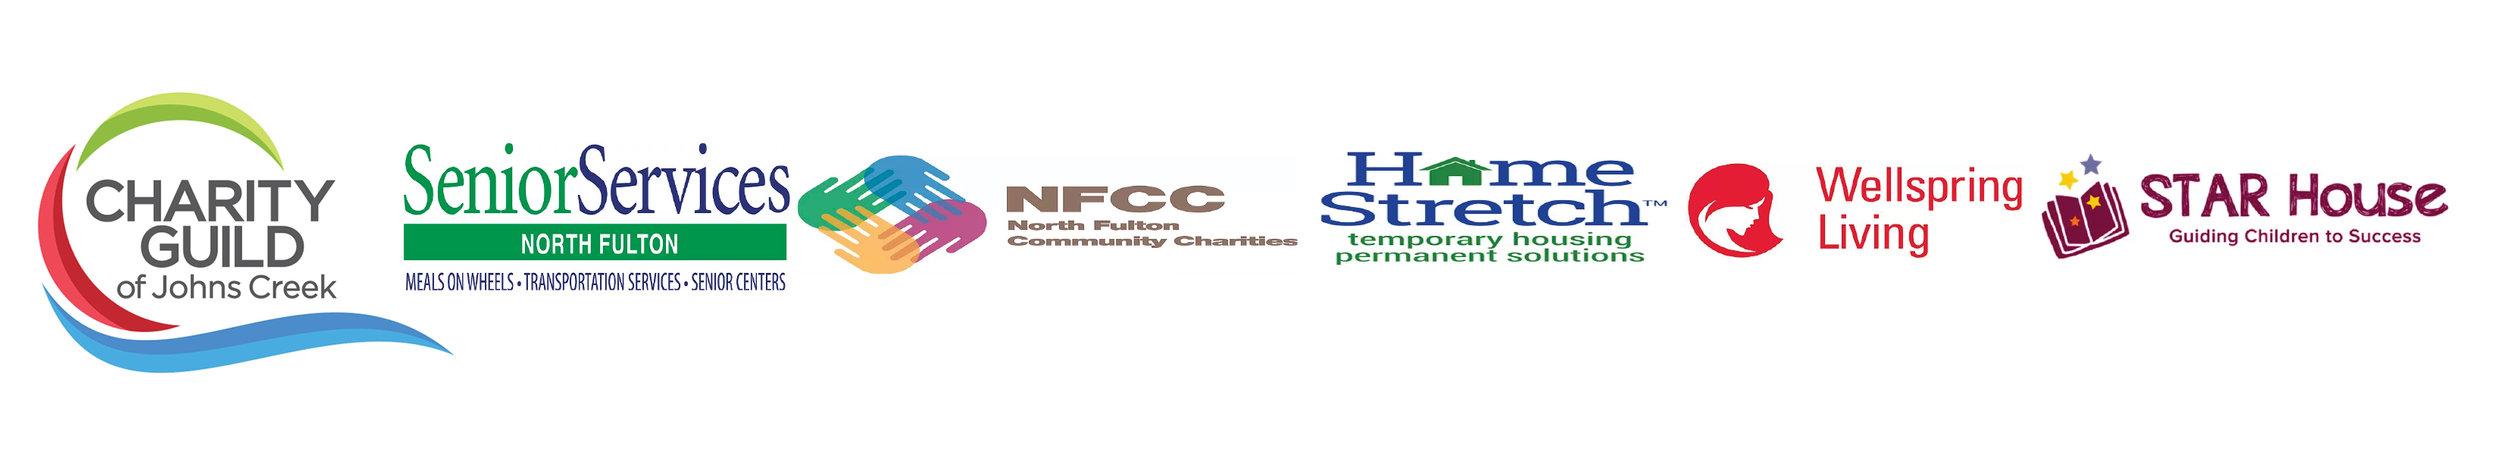 Charity Guild Logos of Charities.jpg